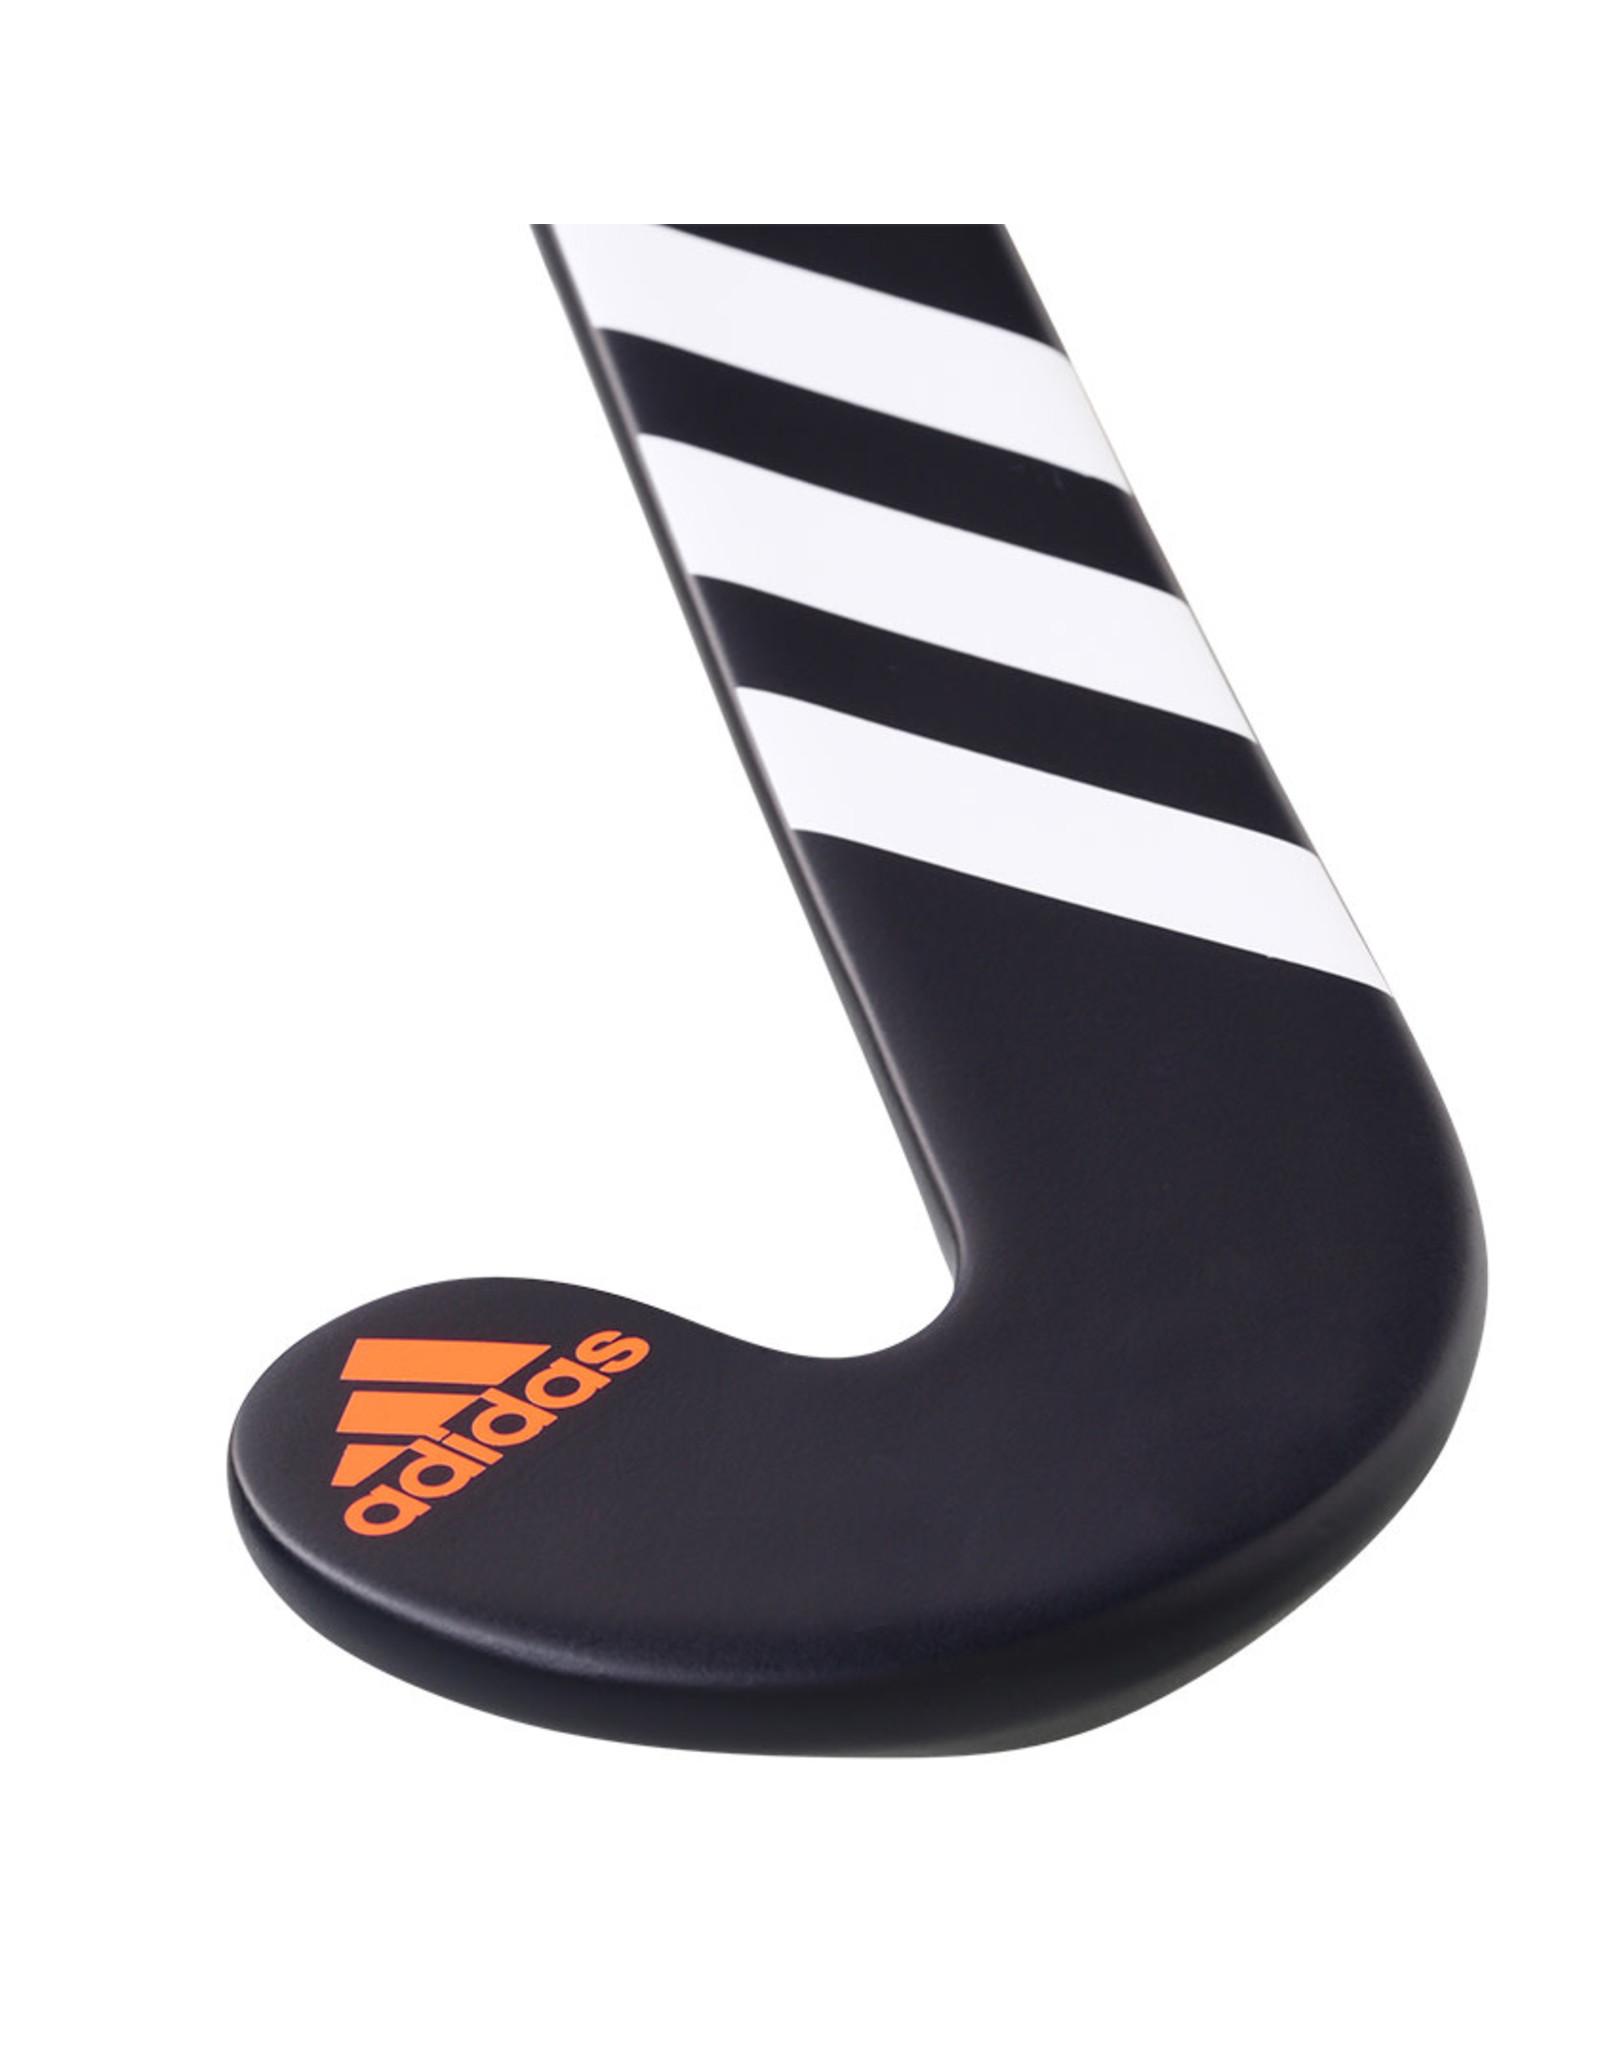 Adidas LX COMPO 3